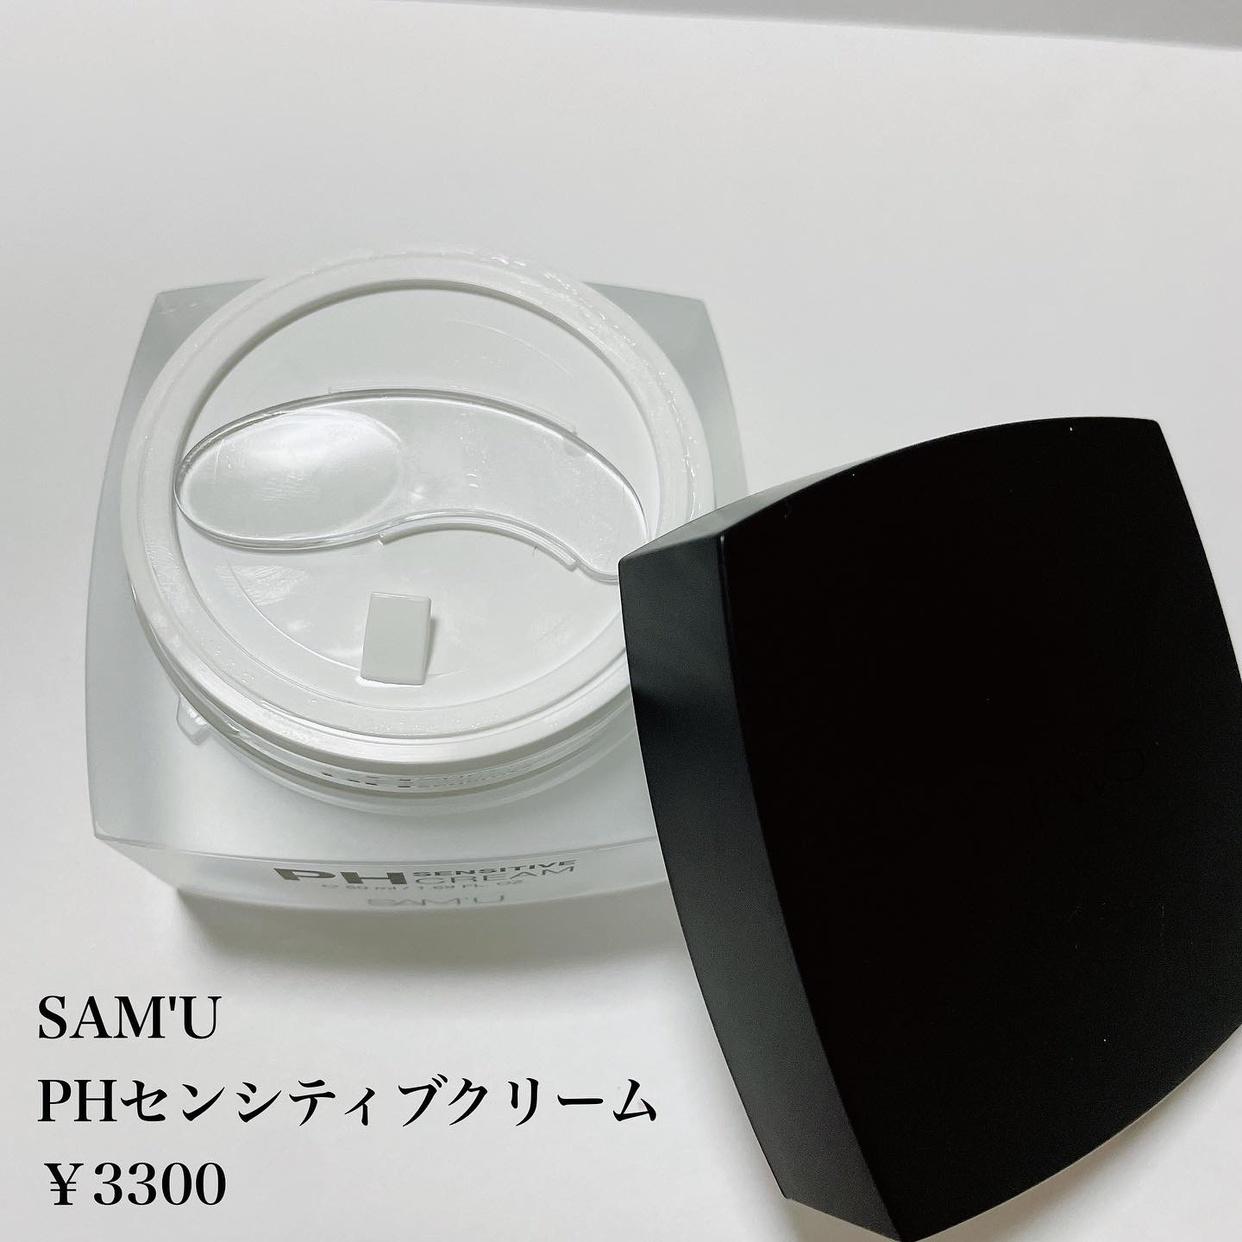 SAM'U(サミュ) PHセンシティブクリームの良い点・メリットに関するここあさんの口コミ画像2